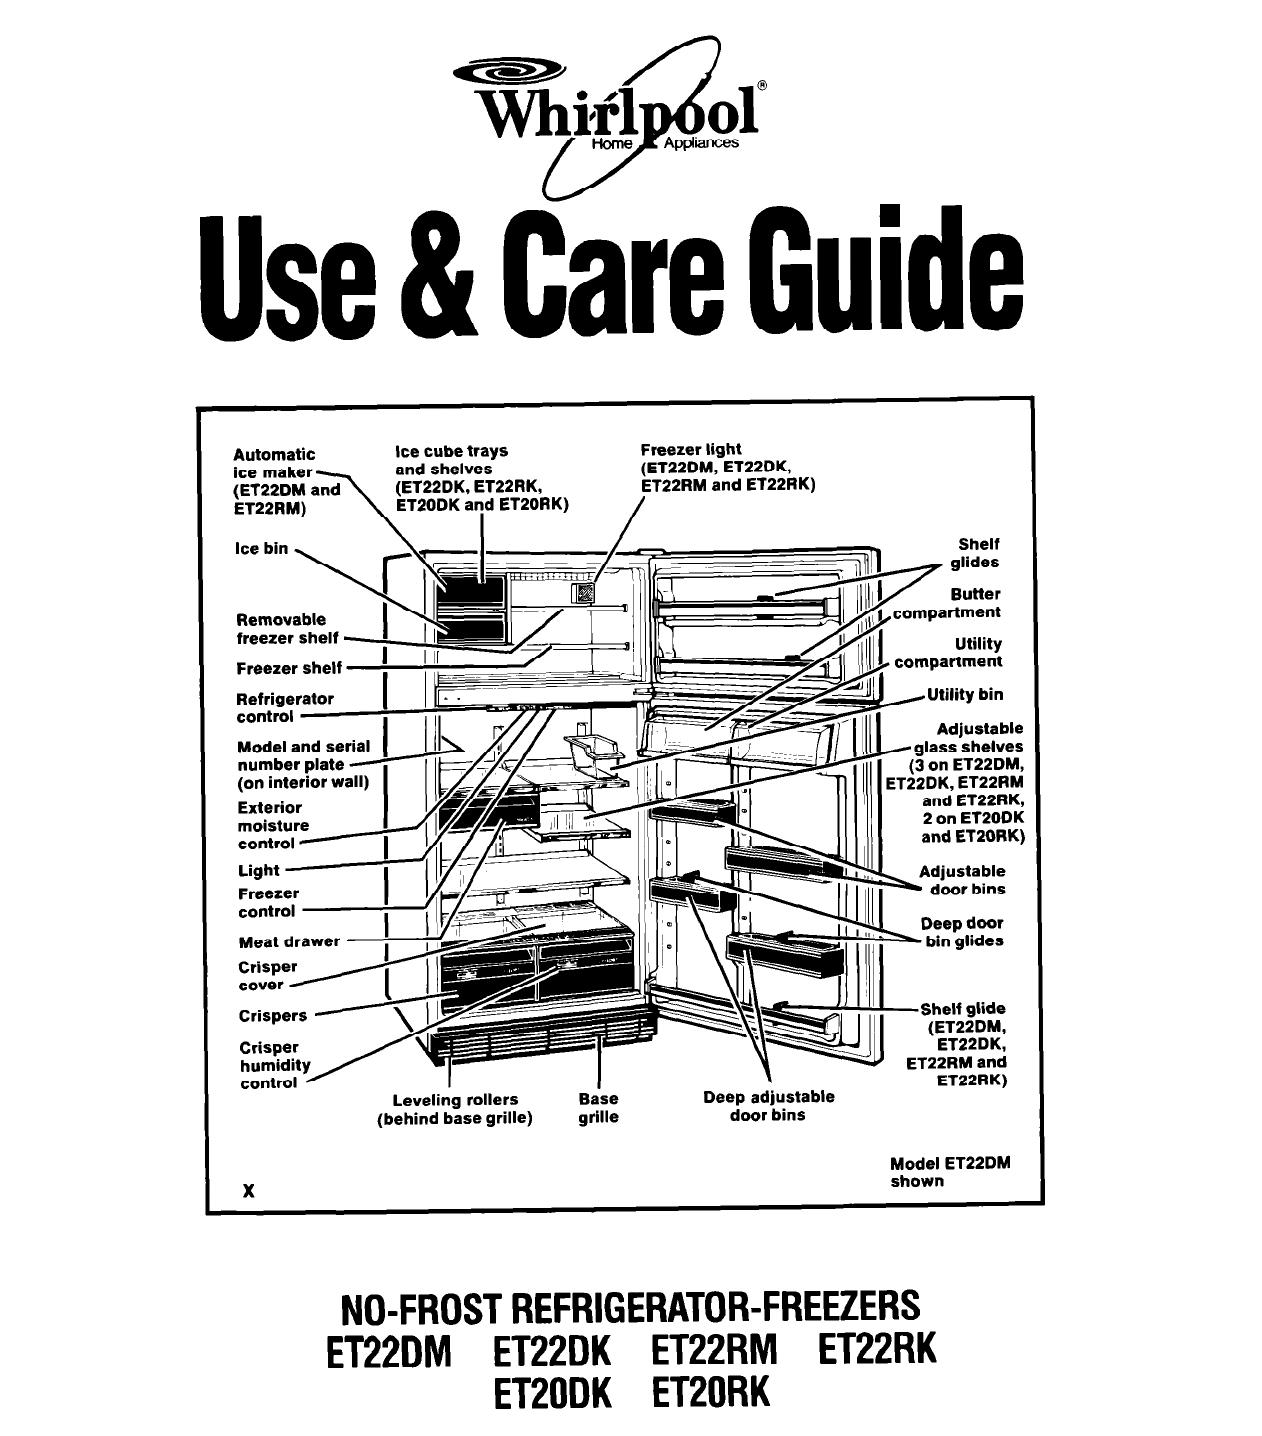 User manual for westinghouse fridge wtm5200pb